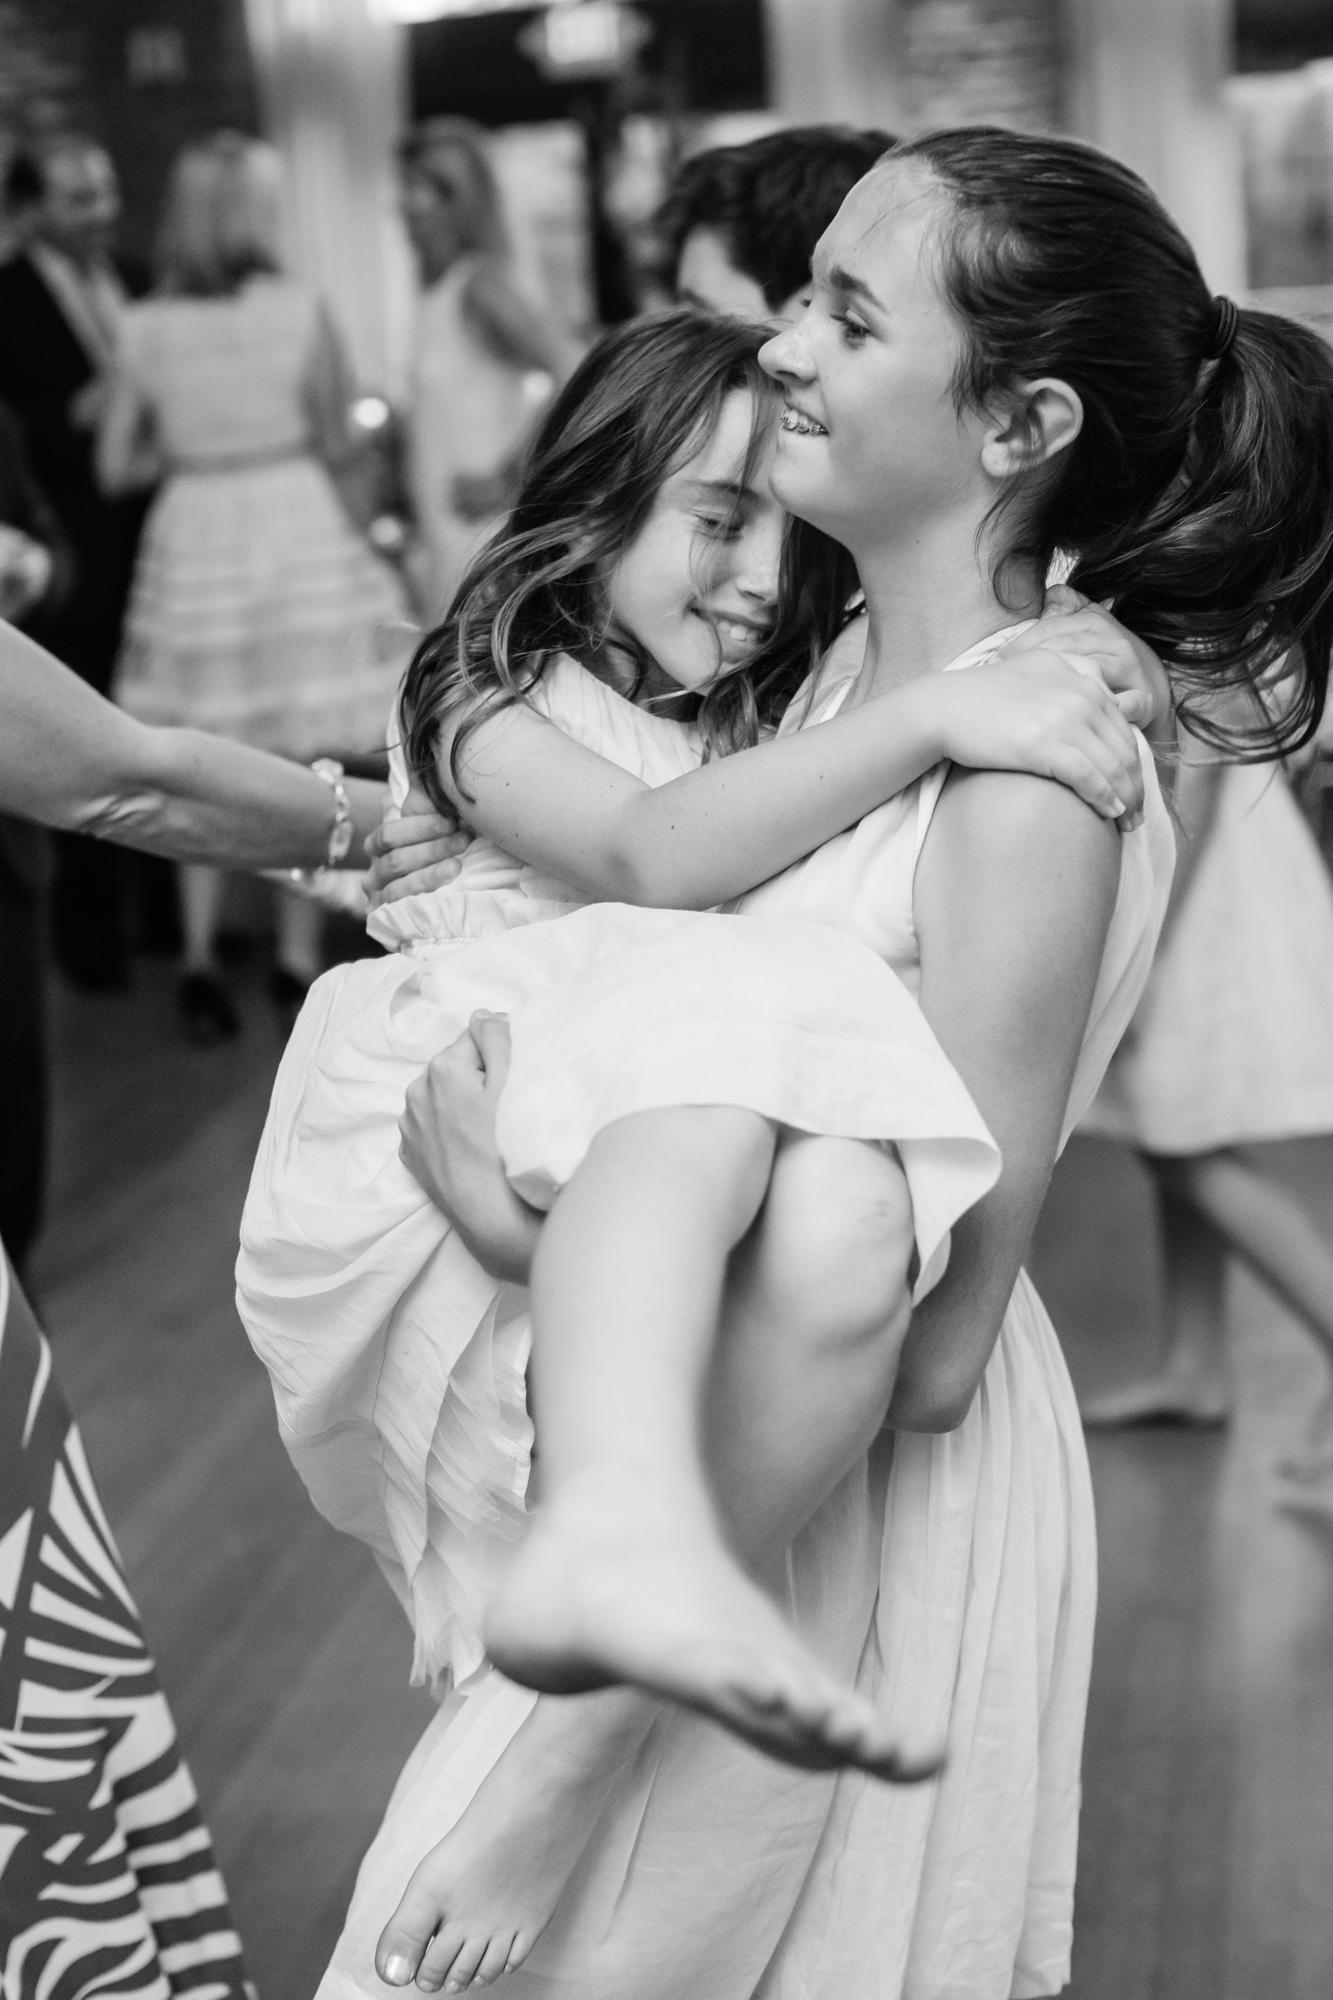 76_Rowan_Brian_The_Roundhouse_Wedding_Beacon_NY_Tanya_Salazar_Photography_837.jpg